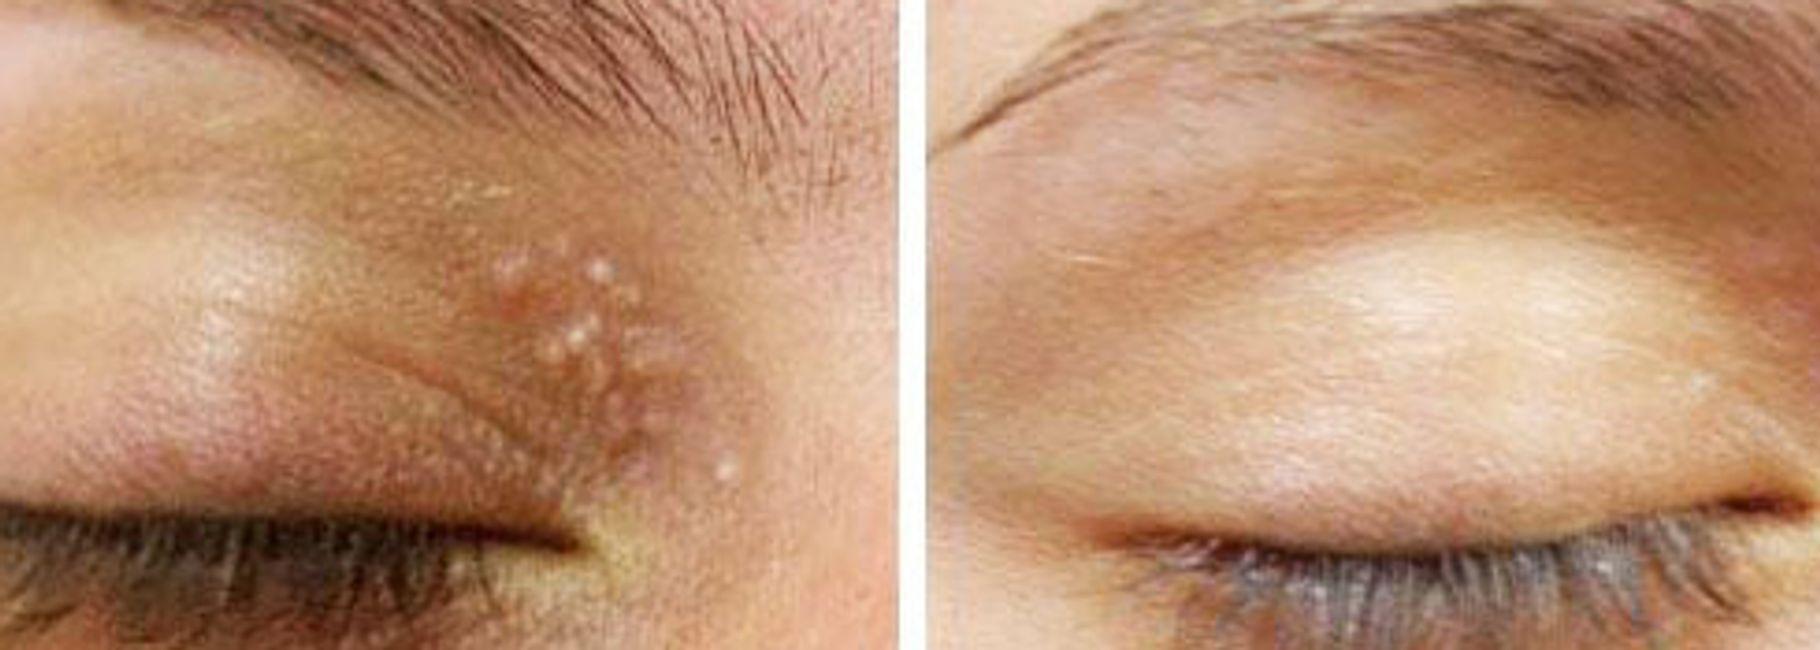 Milia Skin Tag Removal Petals Yorkville Beauty Brow Lash Bar